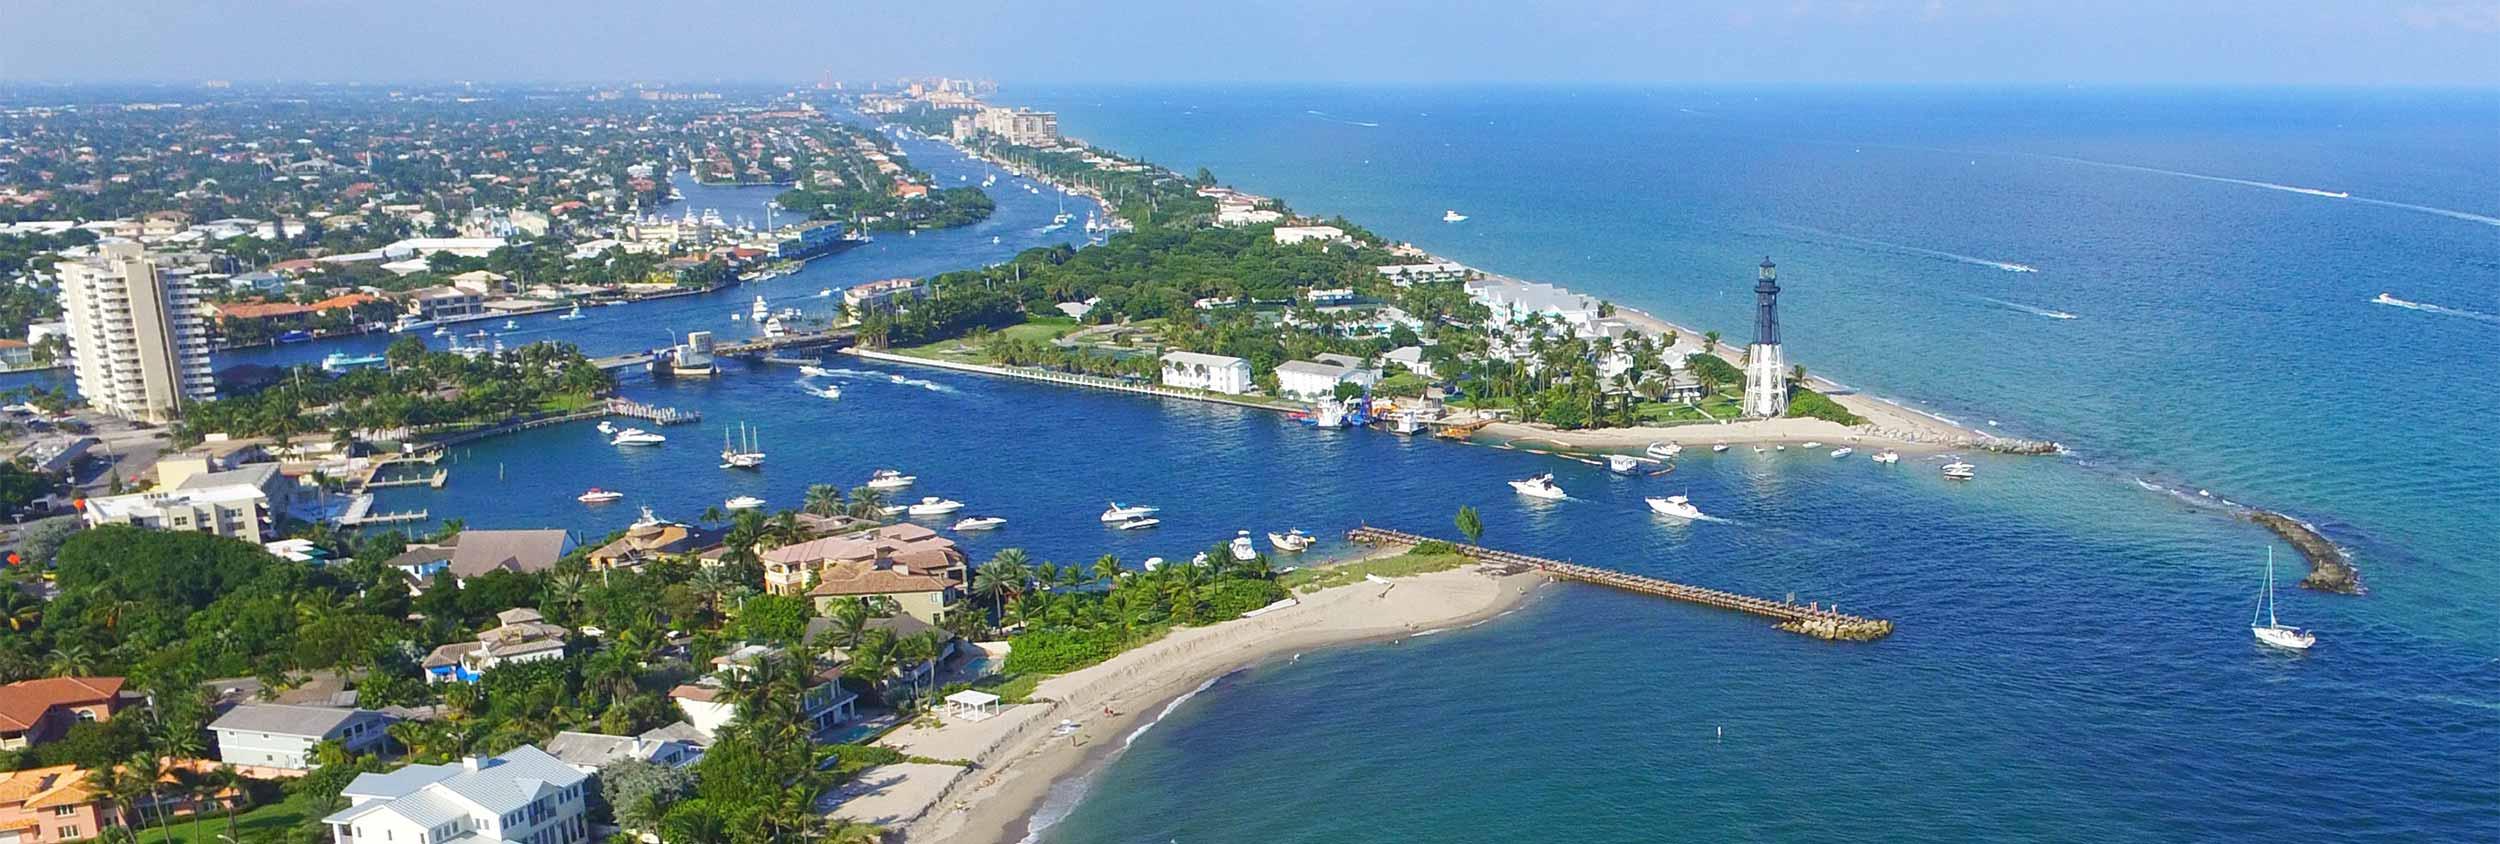 Kitesurfing Florida - Pompano Beach